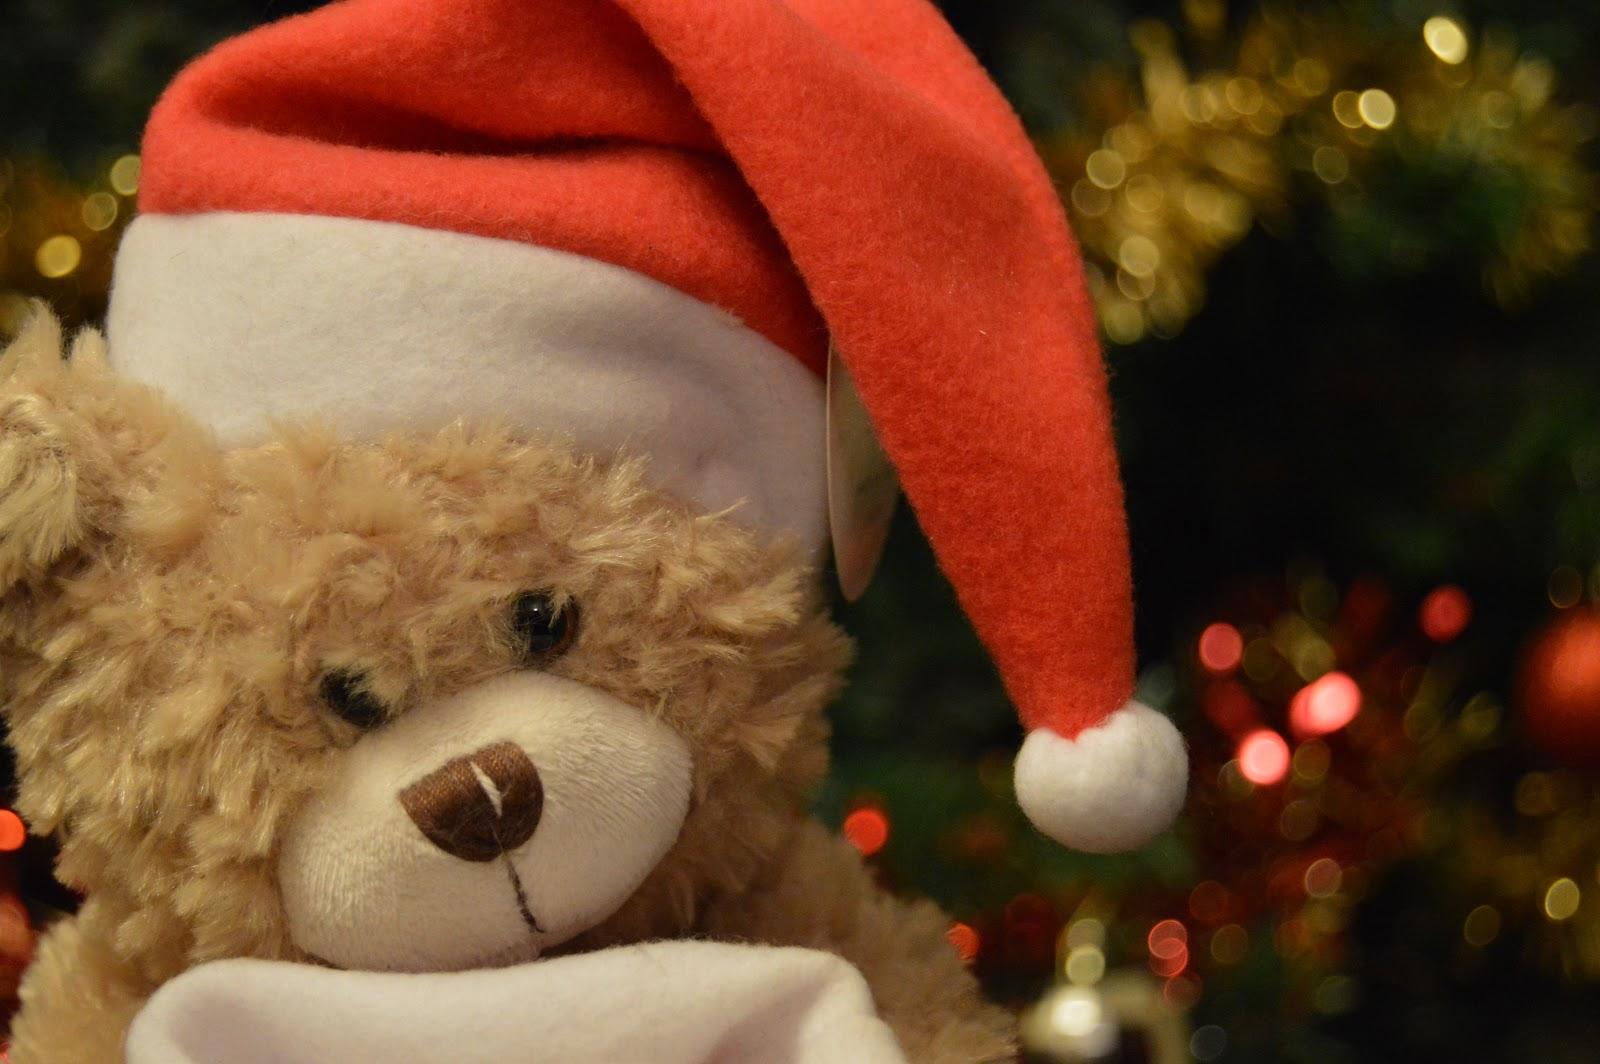 teddy, christmas, bokeh, cute, 2014, what i got for christmas